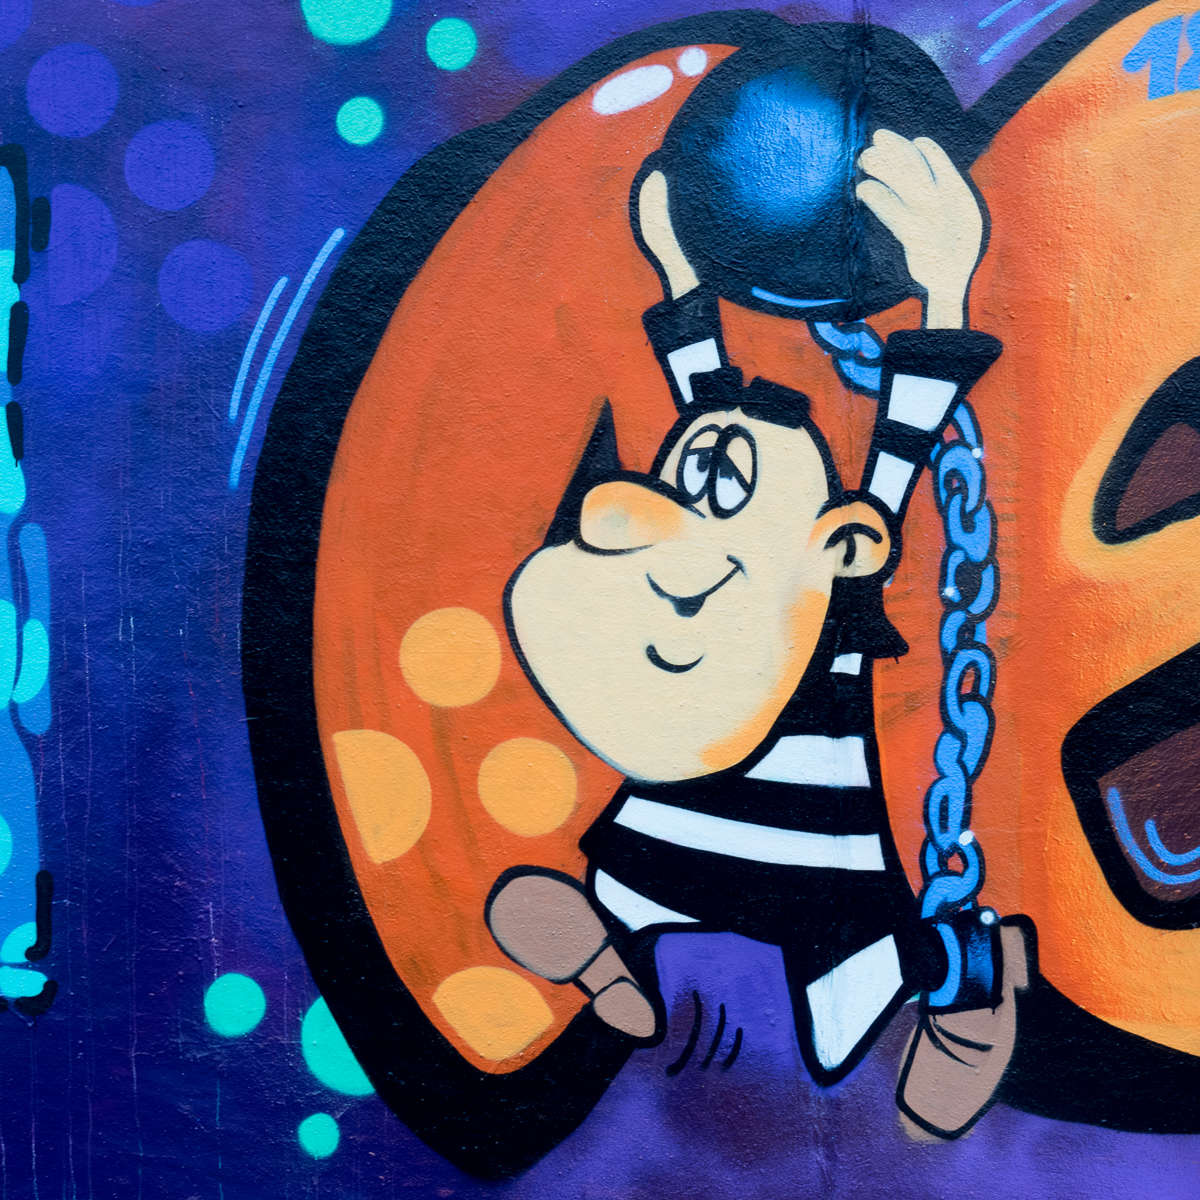 Frankfurt – Graffiti am Ratswegkreisel (89) – AETS Special